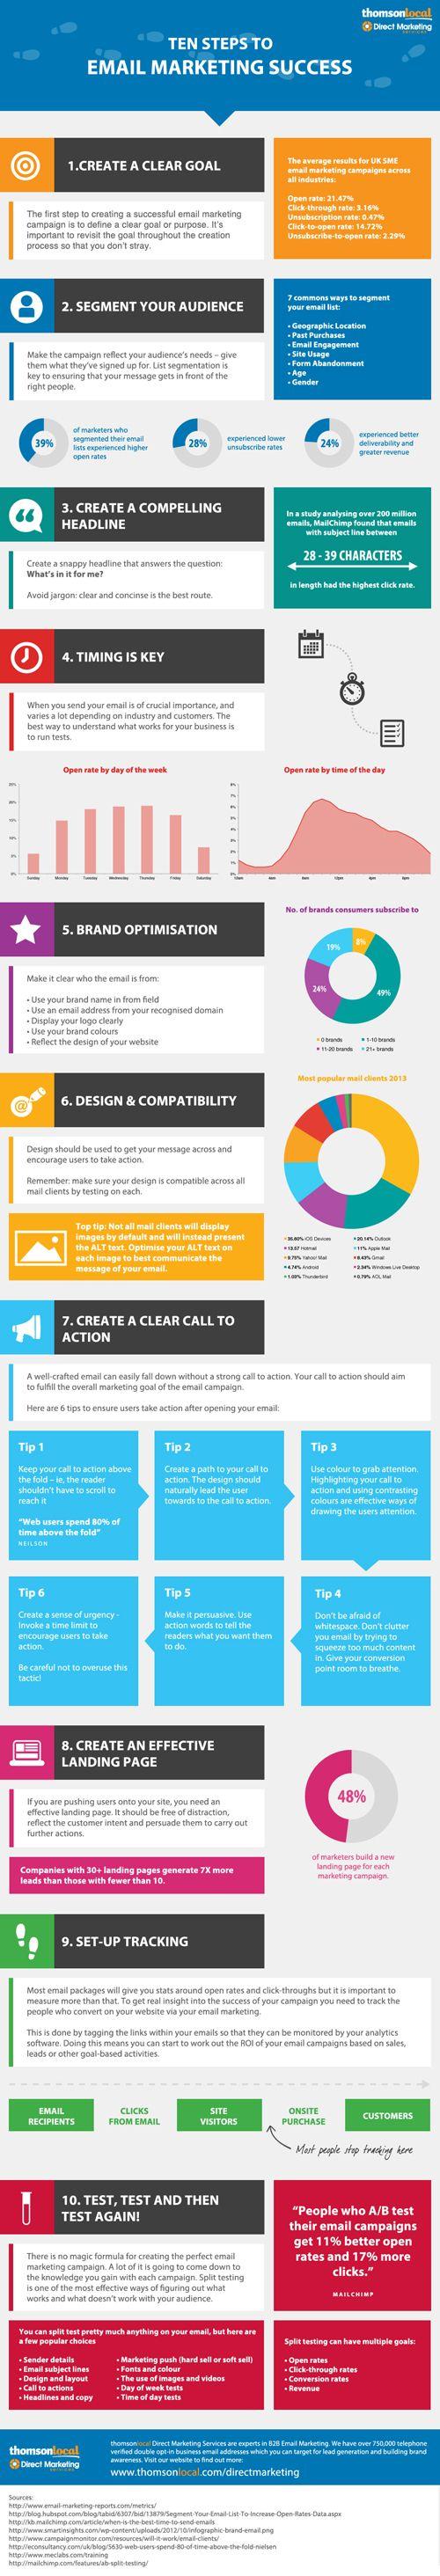 10 Steps to E-Mail Marketing Success